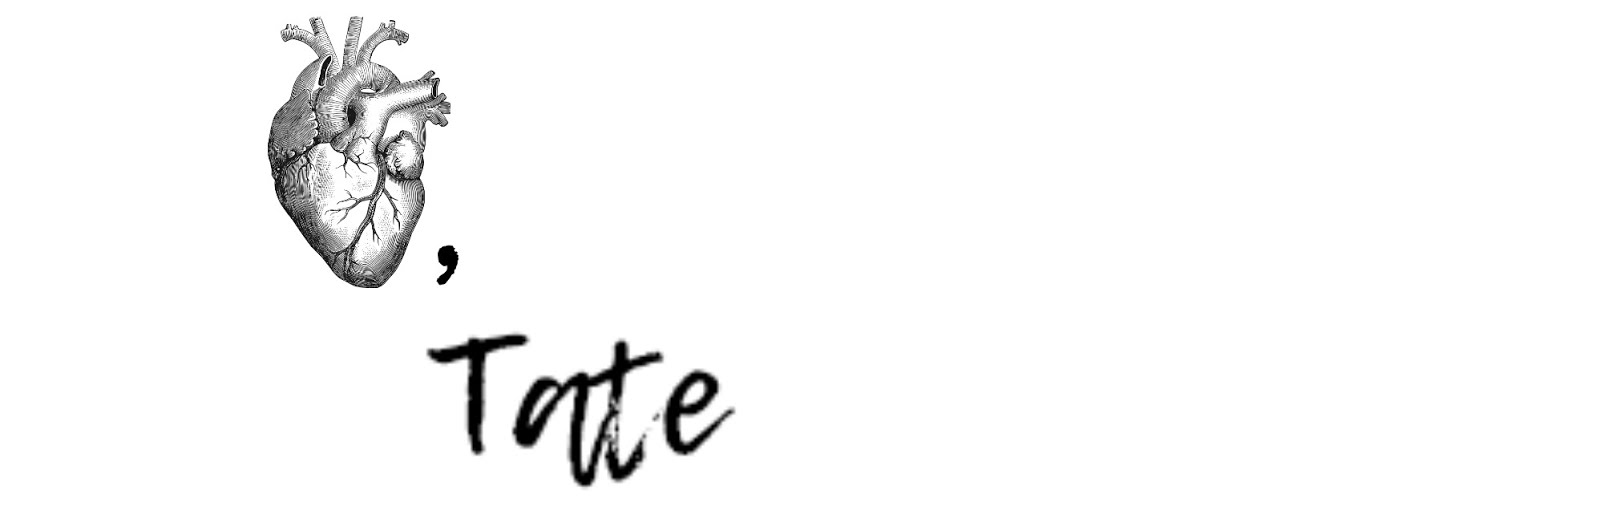 Sim*Vivo Suture Review | Tate Does Things